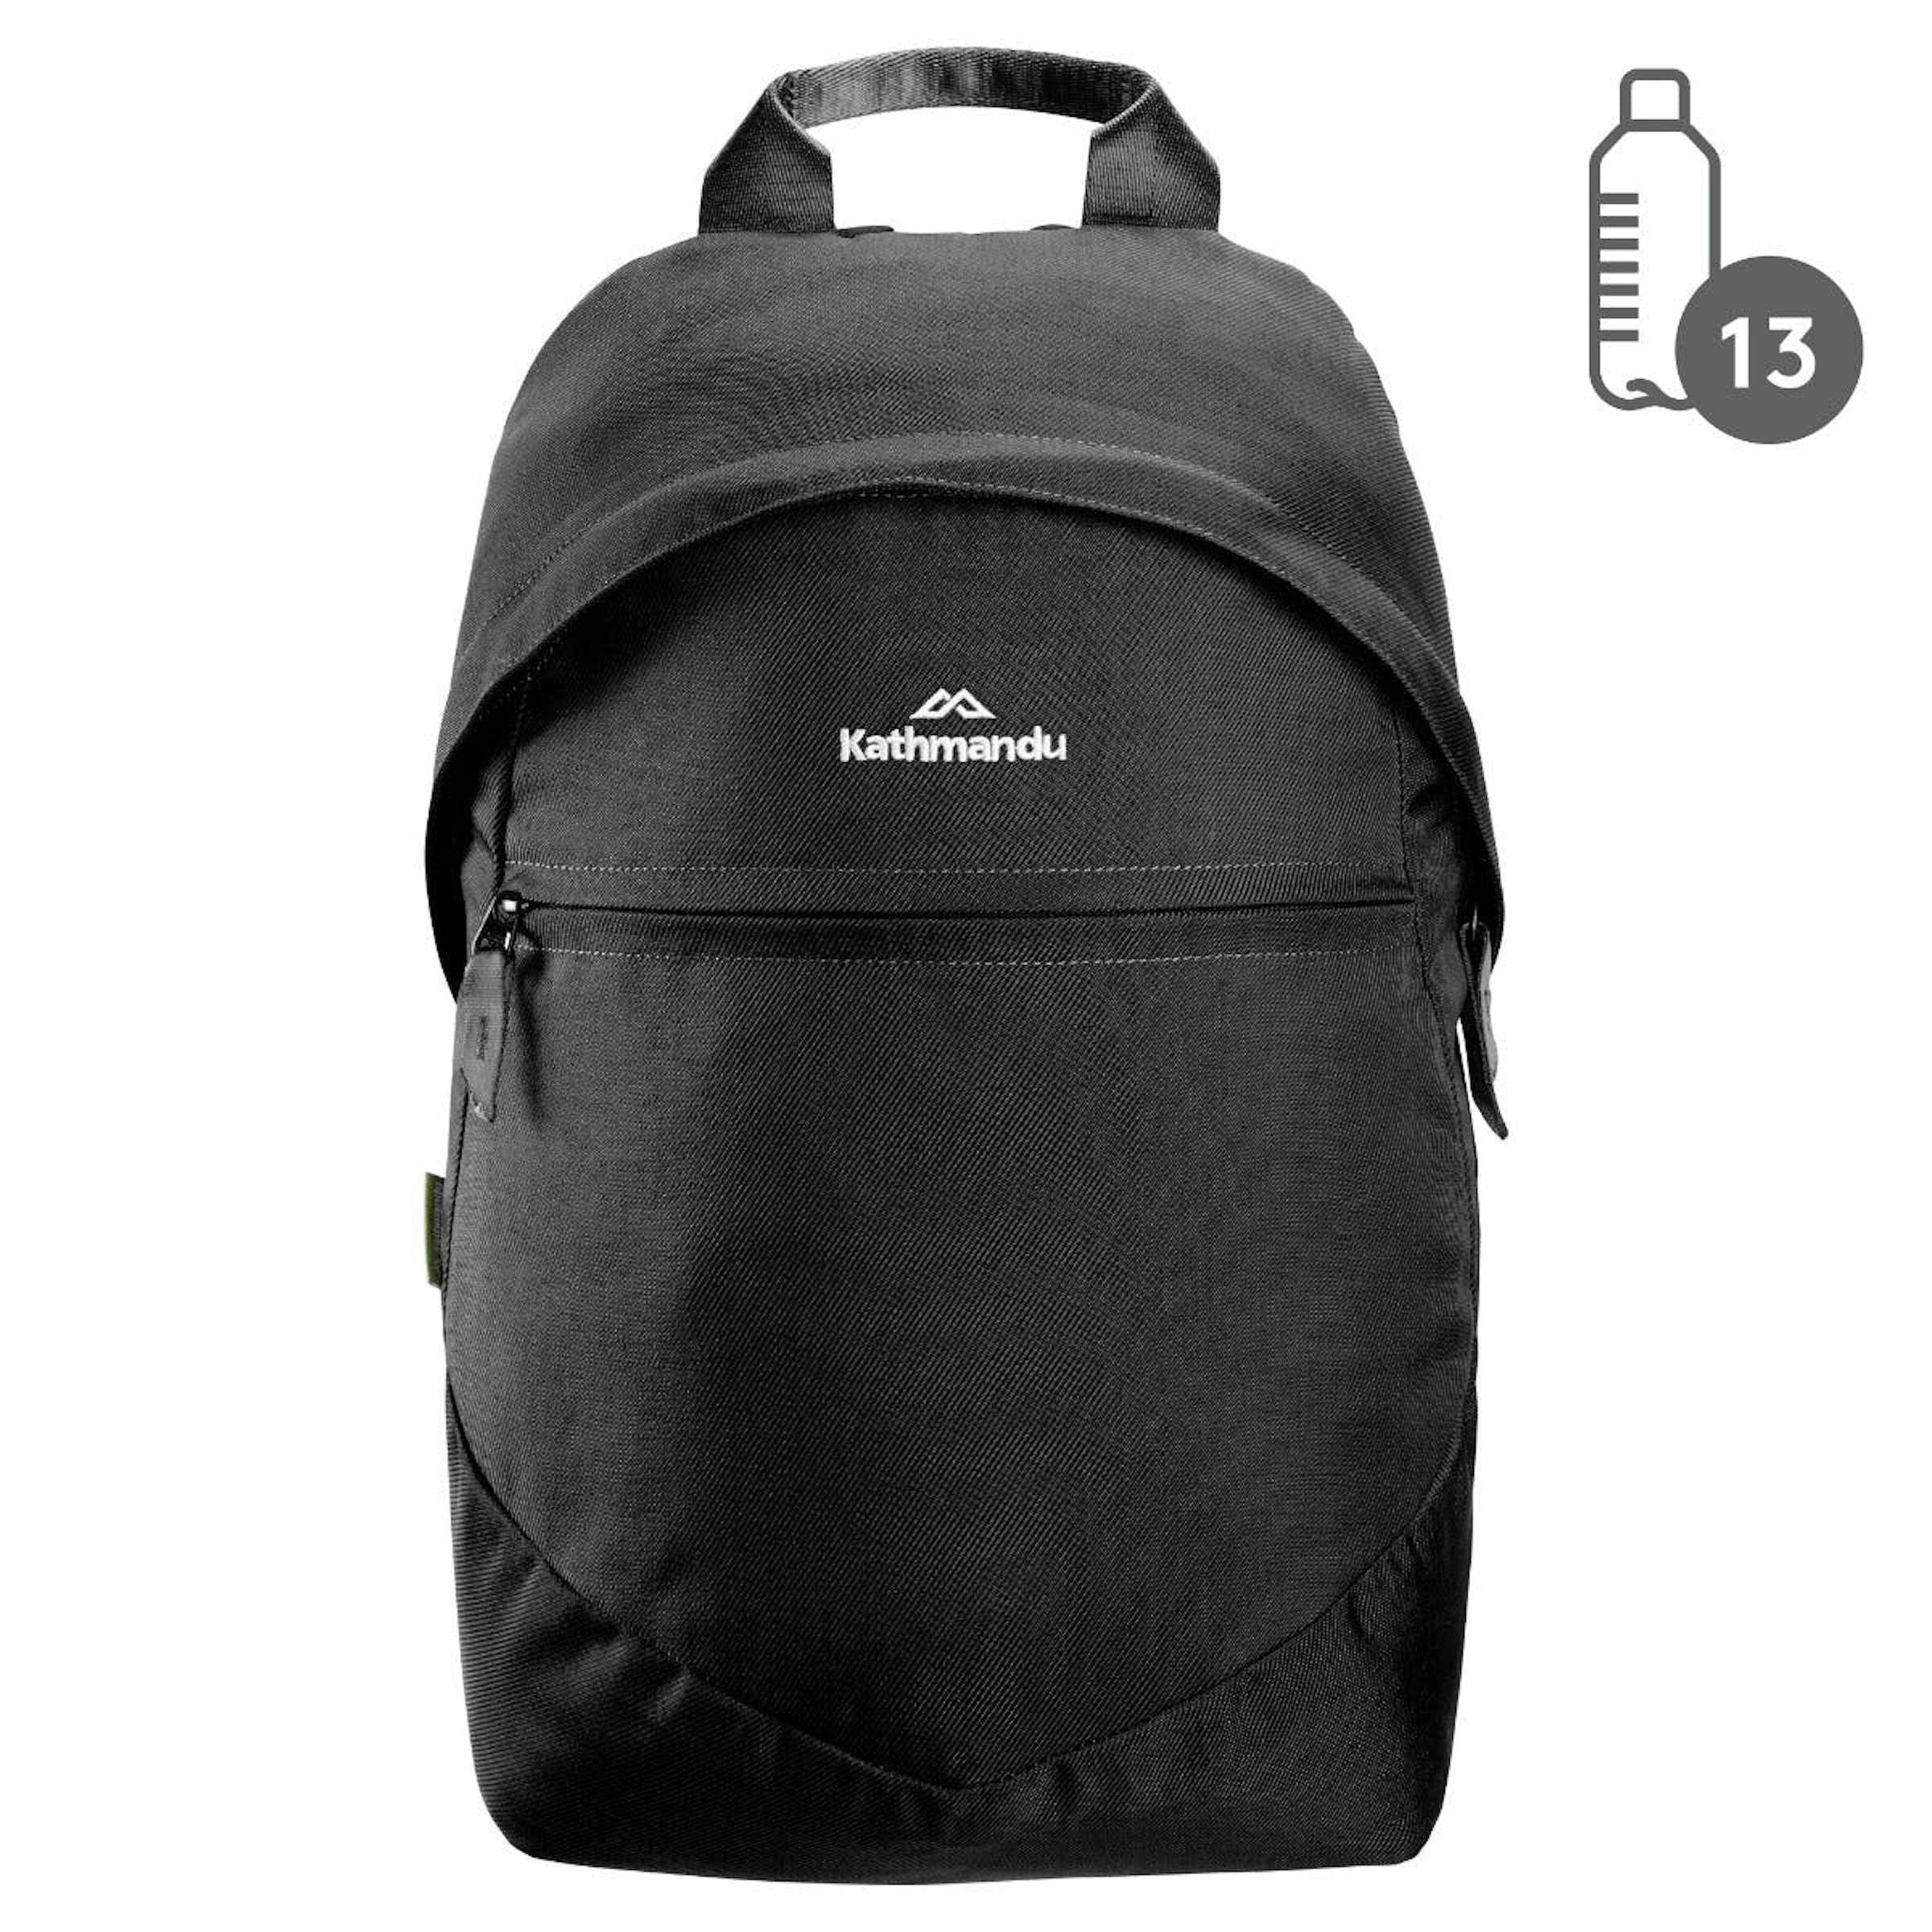 285cfe591c85 Kathmandu Packs & Bags